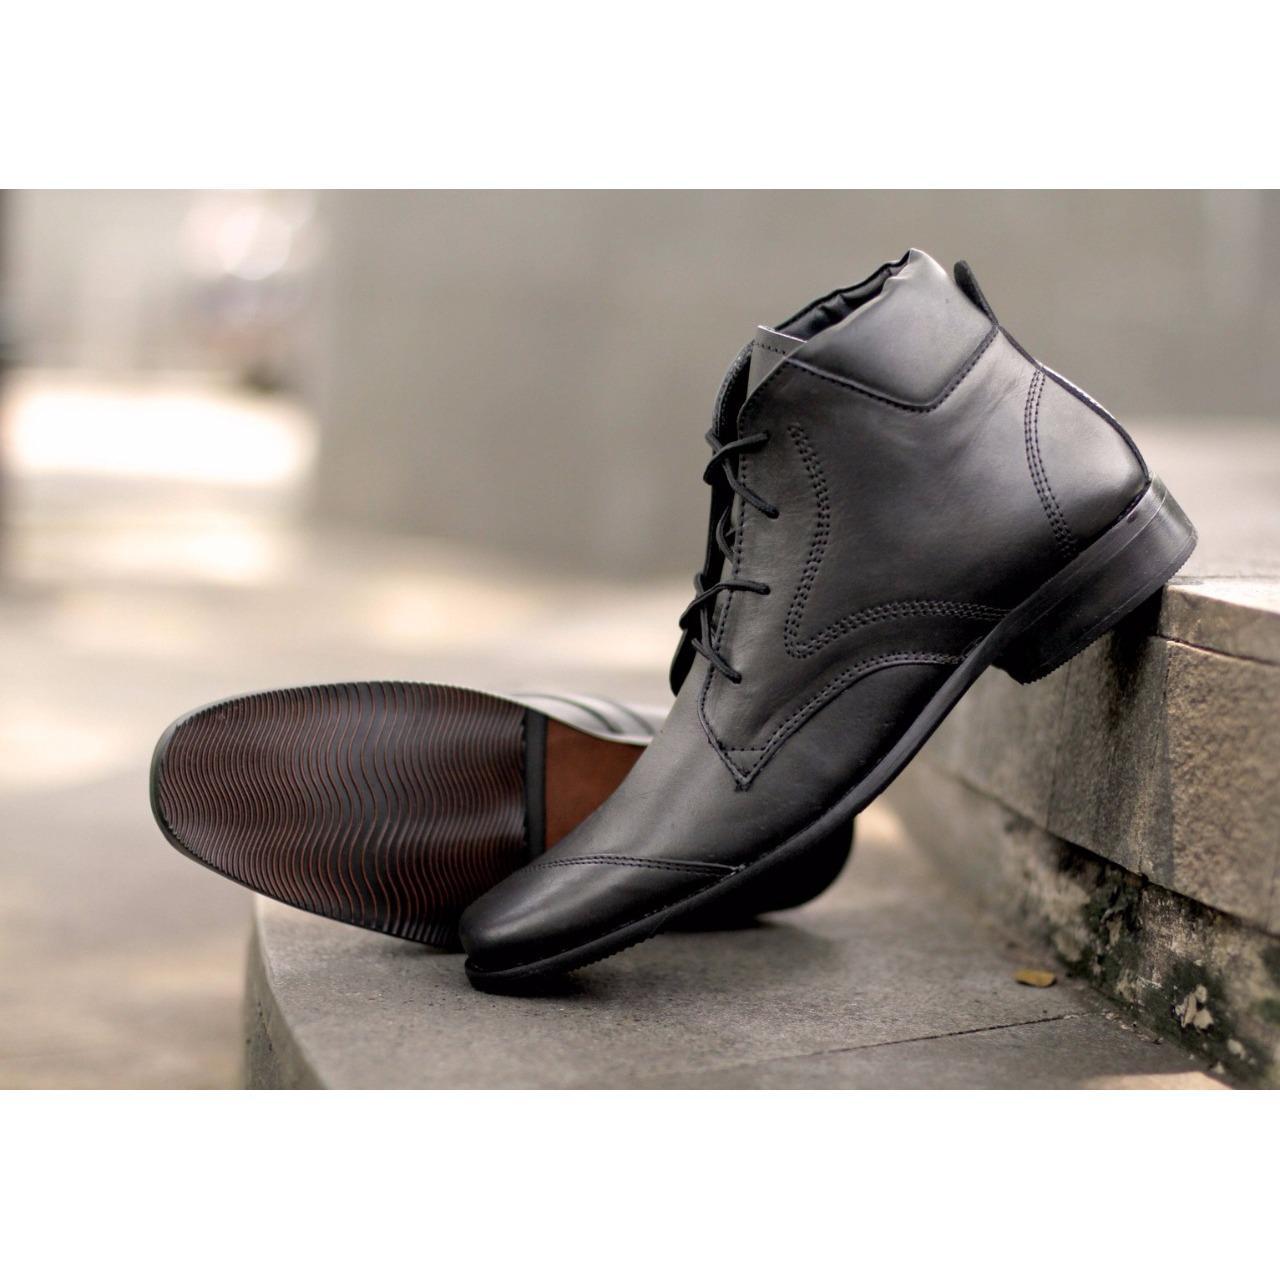 Sepatu Formal pantopel Kulit Pria Pantofel Kerja pantovel Kantor Kombinasi Kulit  pantofel - Hitam Distro Bandung 22b2469595